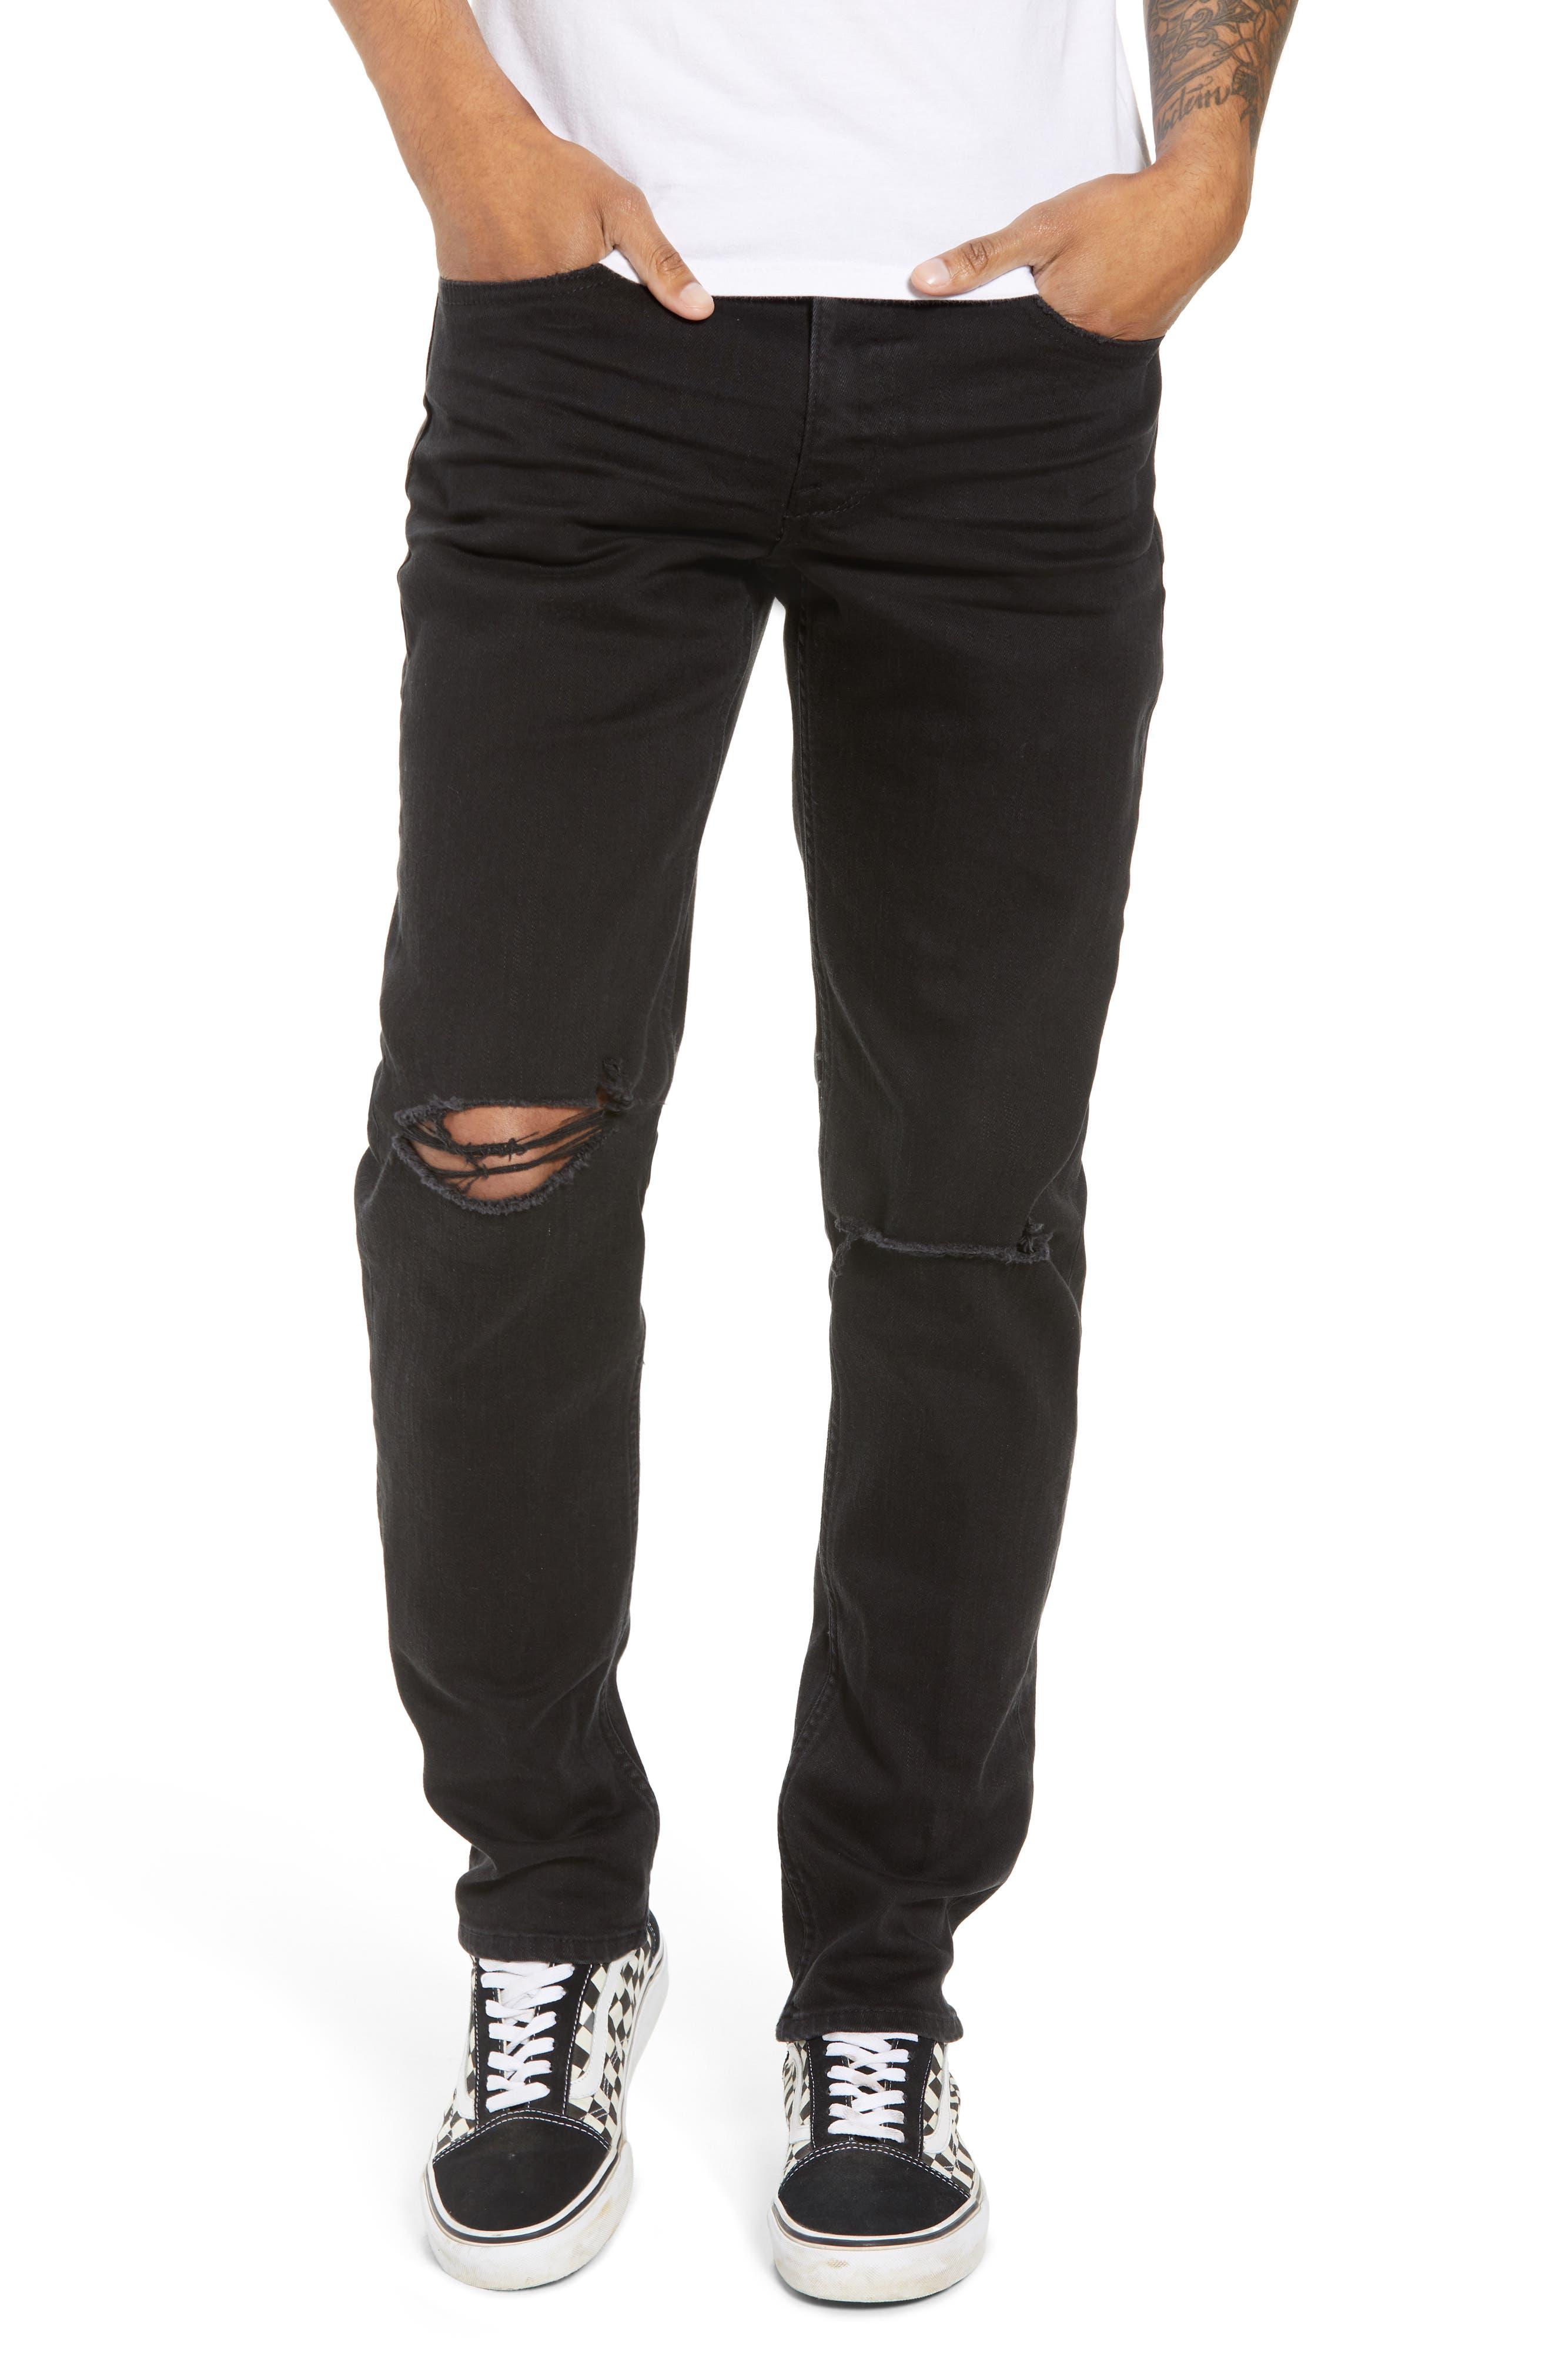 THE RAIL, Ripped Skinny Jeans, Main thumbnail 1, color, BLACK STONE WASH